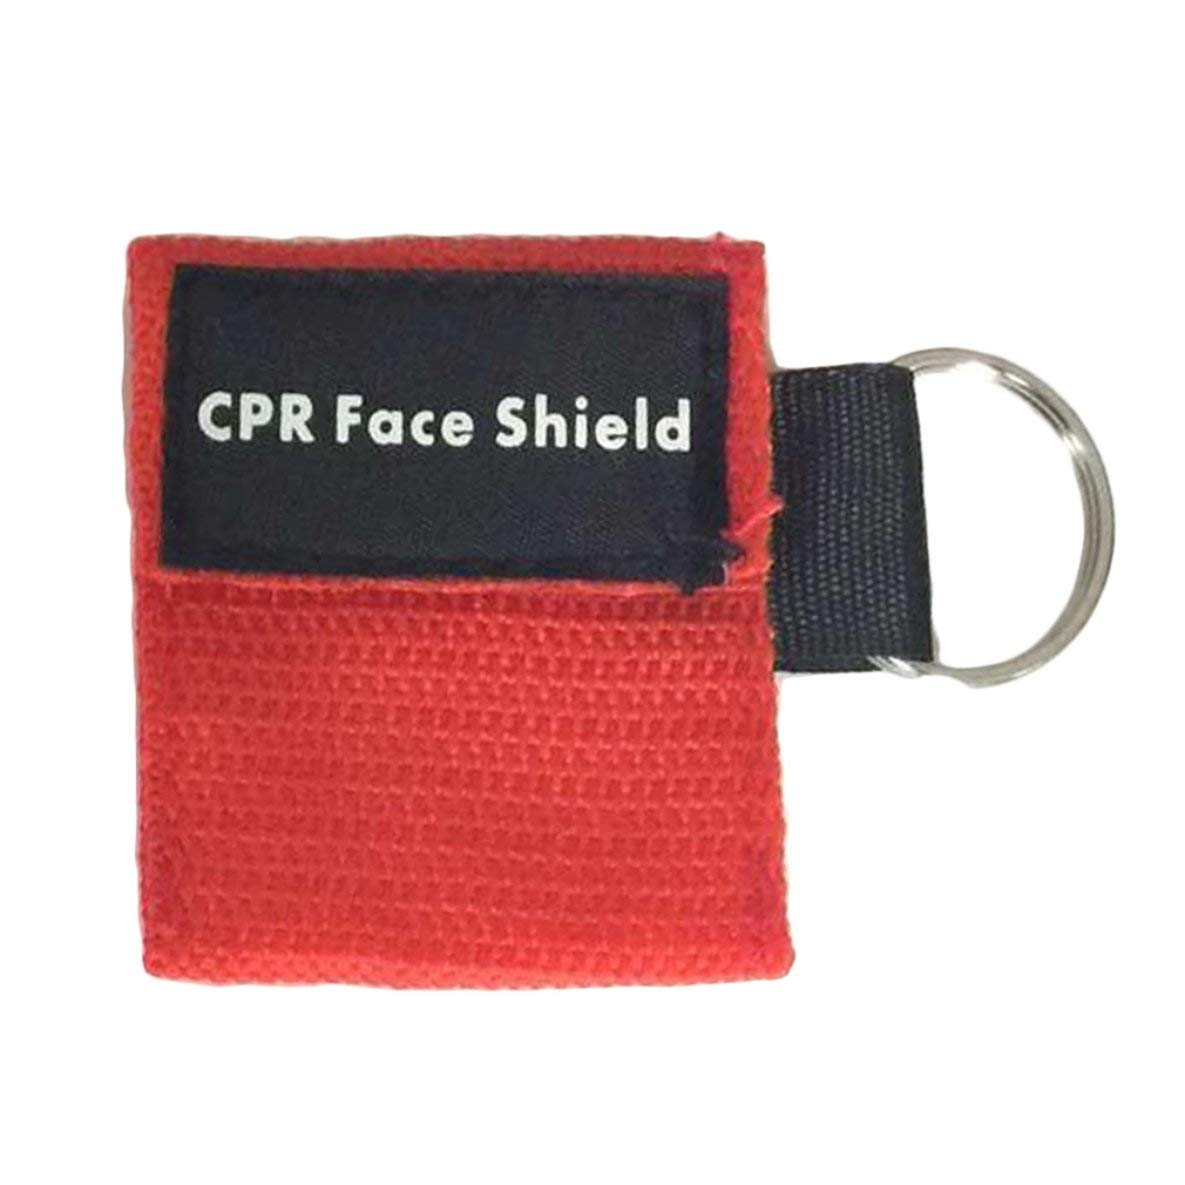 Noradtjcca 2pcs Portatile Primo Soccorso Mini CPR Portachiavi Maschera//Maschera Scudo facciale Kit di Assistenza Sanitaria Maschere 1-Way valvola CPR Maschera